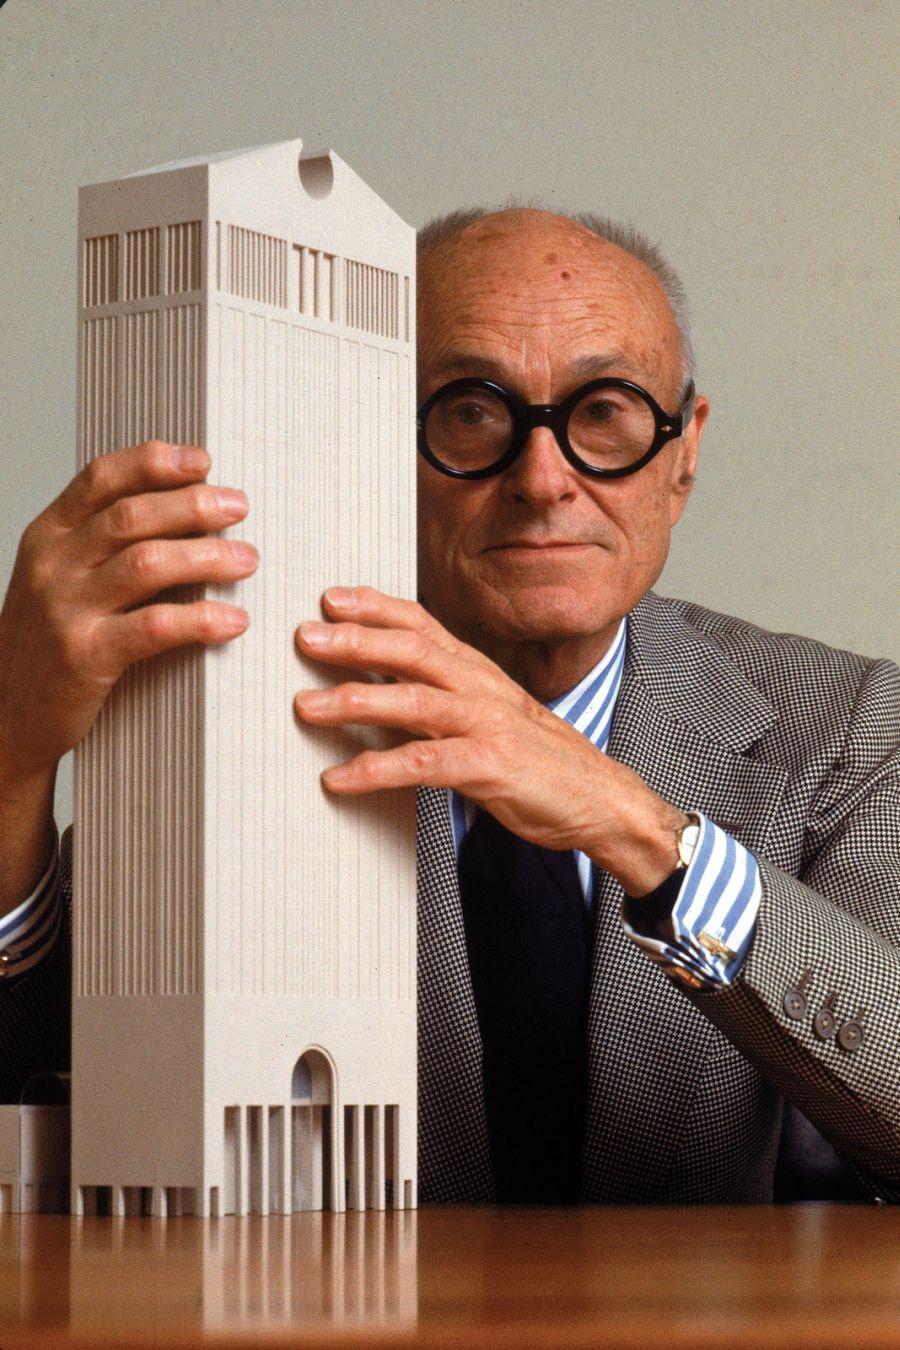 Arquitectos mundialmente famosos comparten con nosotros sus citas m s inspiradoras - Arquitectos de interiores famosos ...